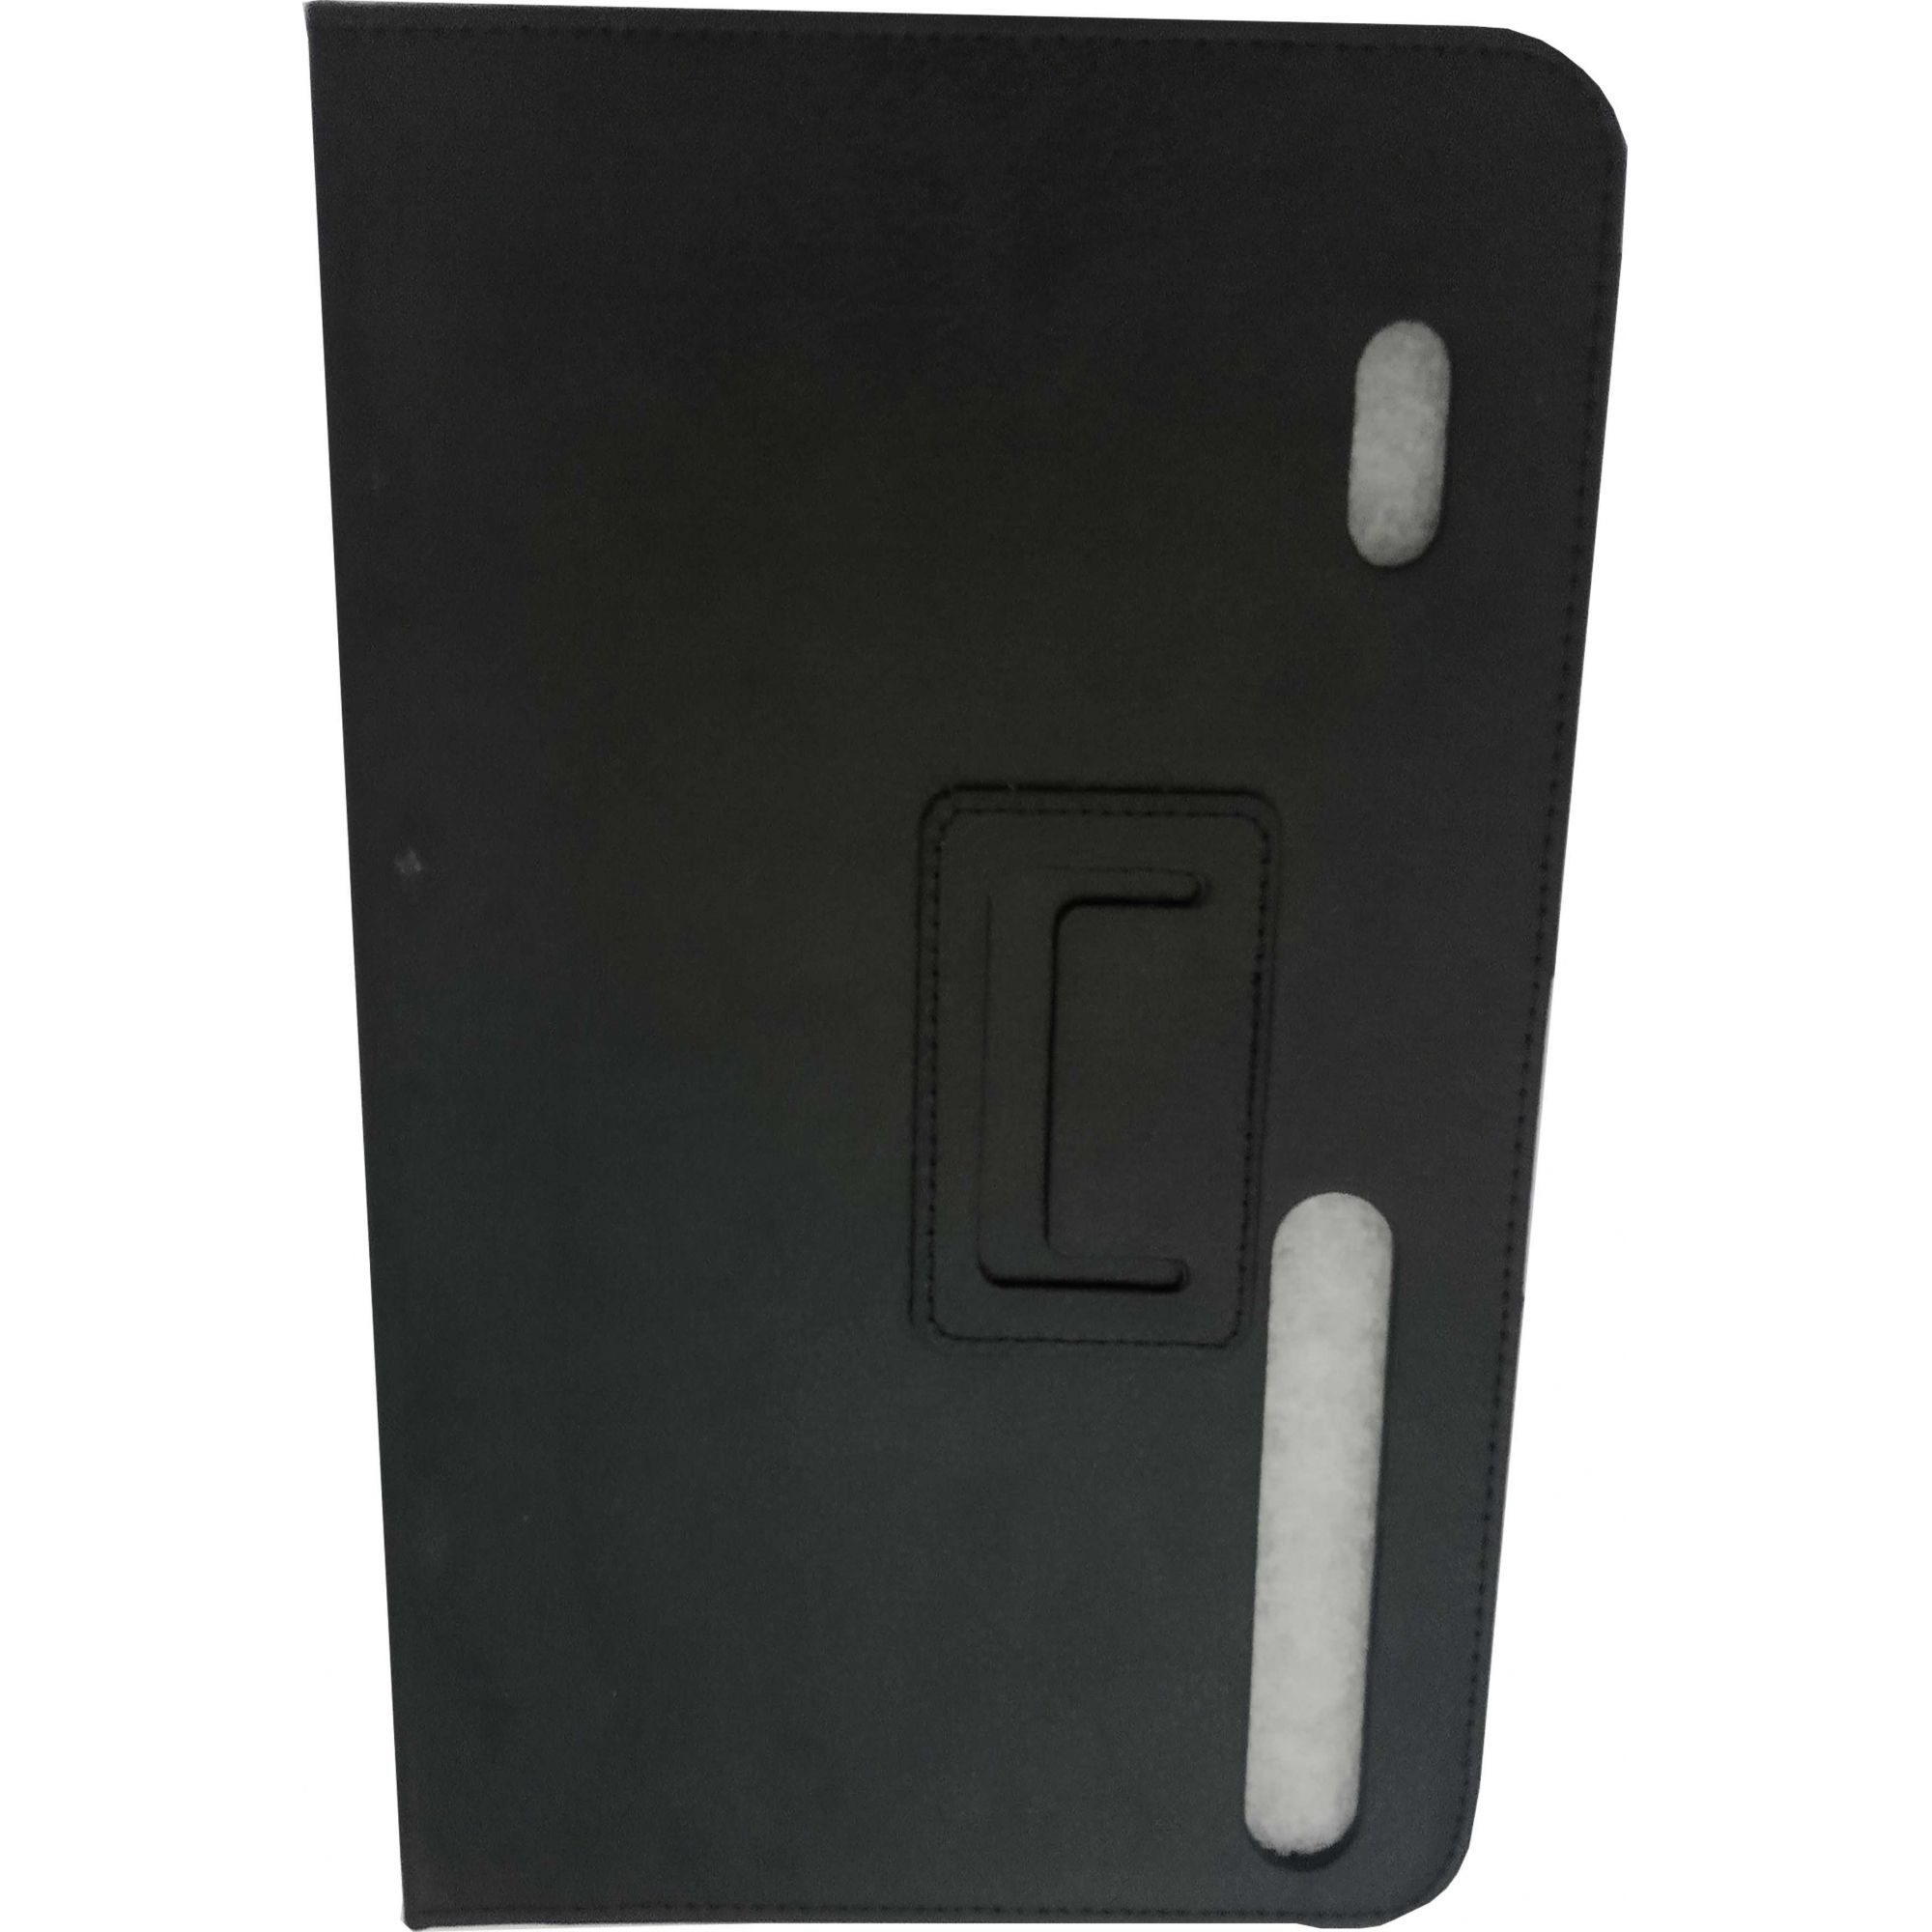 Capa Case Rígida Para Tablet 10 Polegadas Couro Sintético